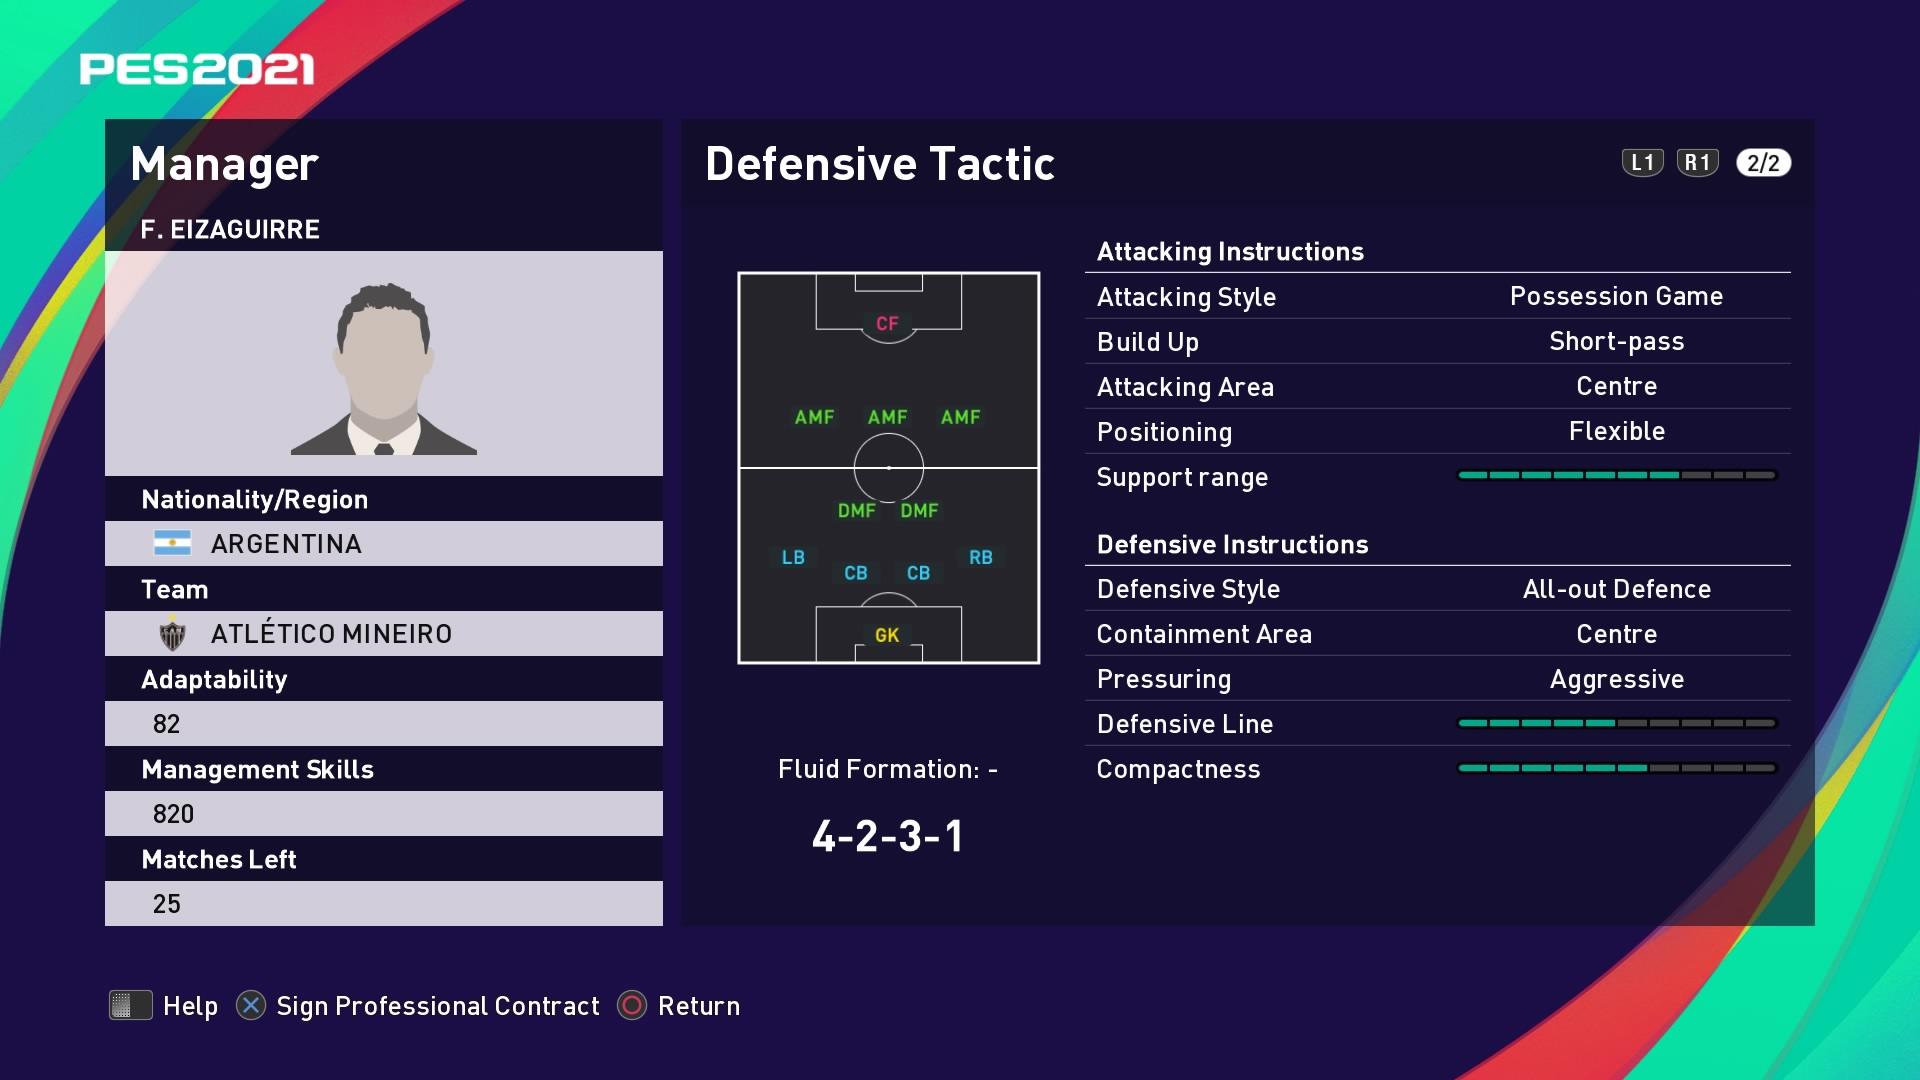 F. Eizaguirre (2) (Jorge Sampaoli) Defensive Tactic in PES 2021 myClub